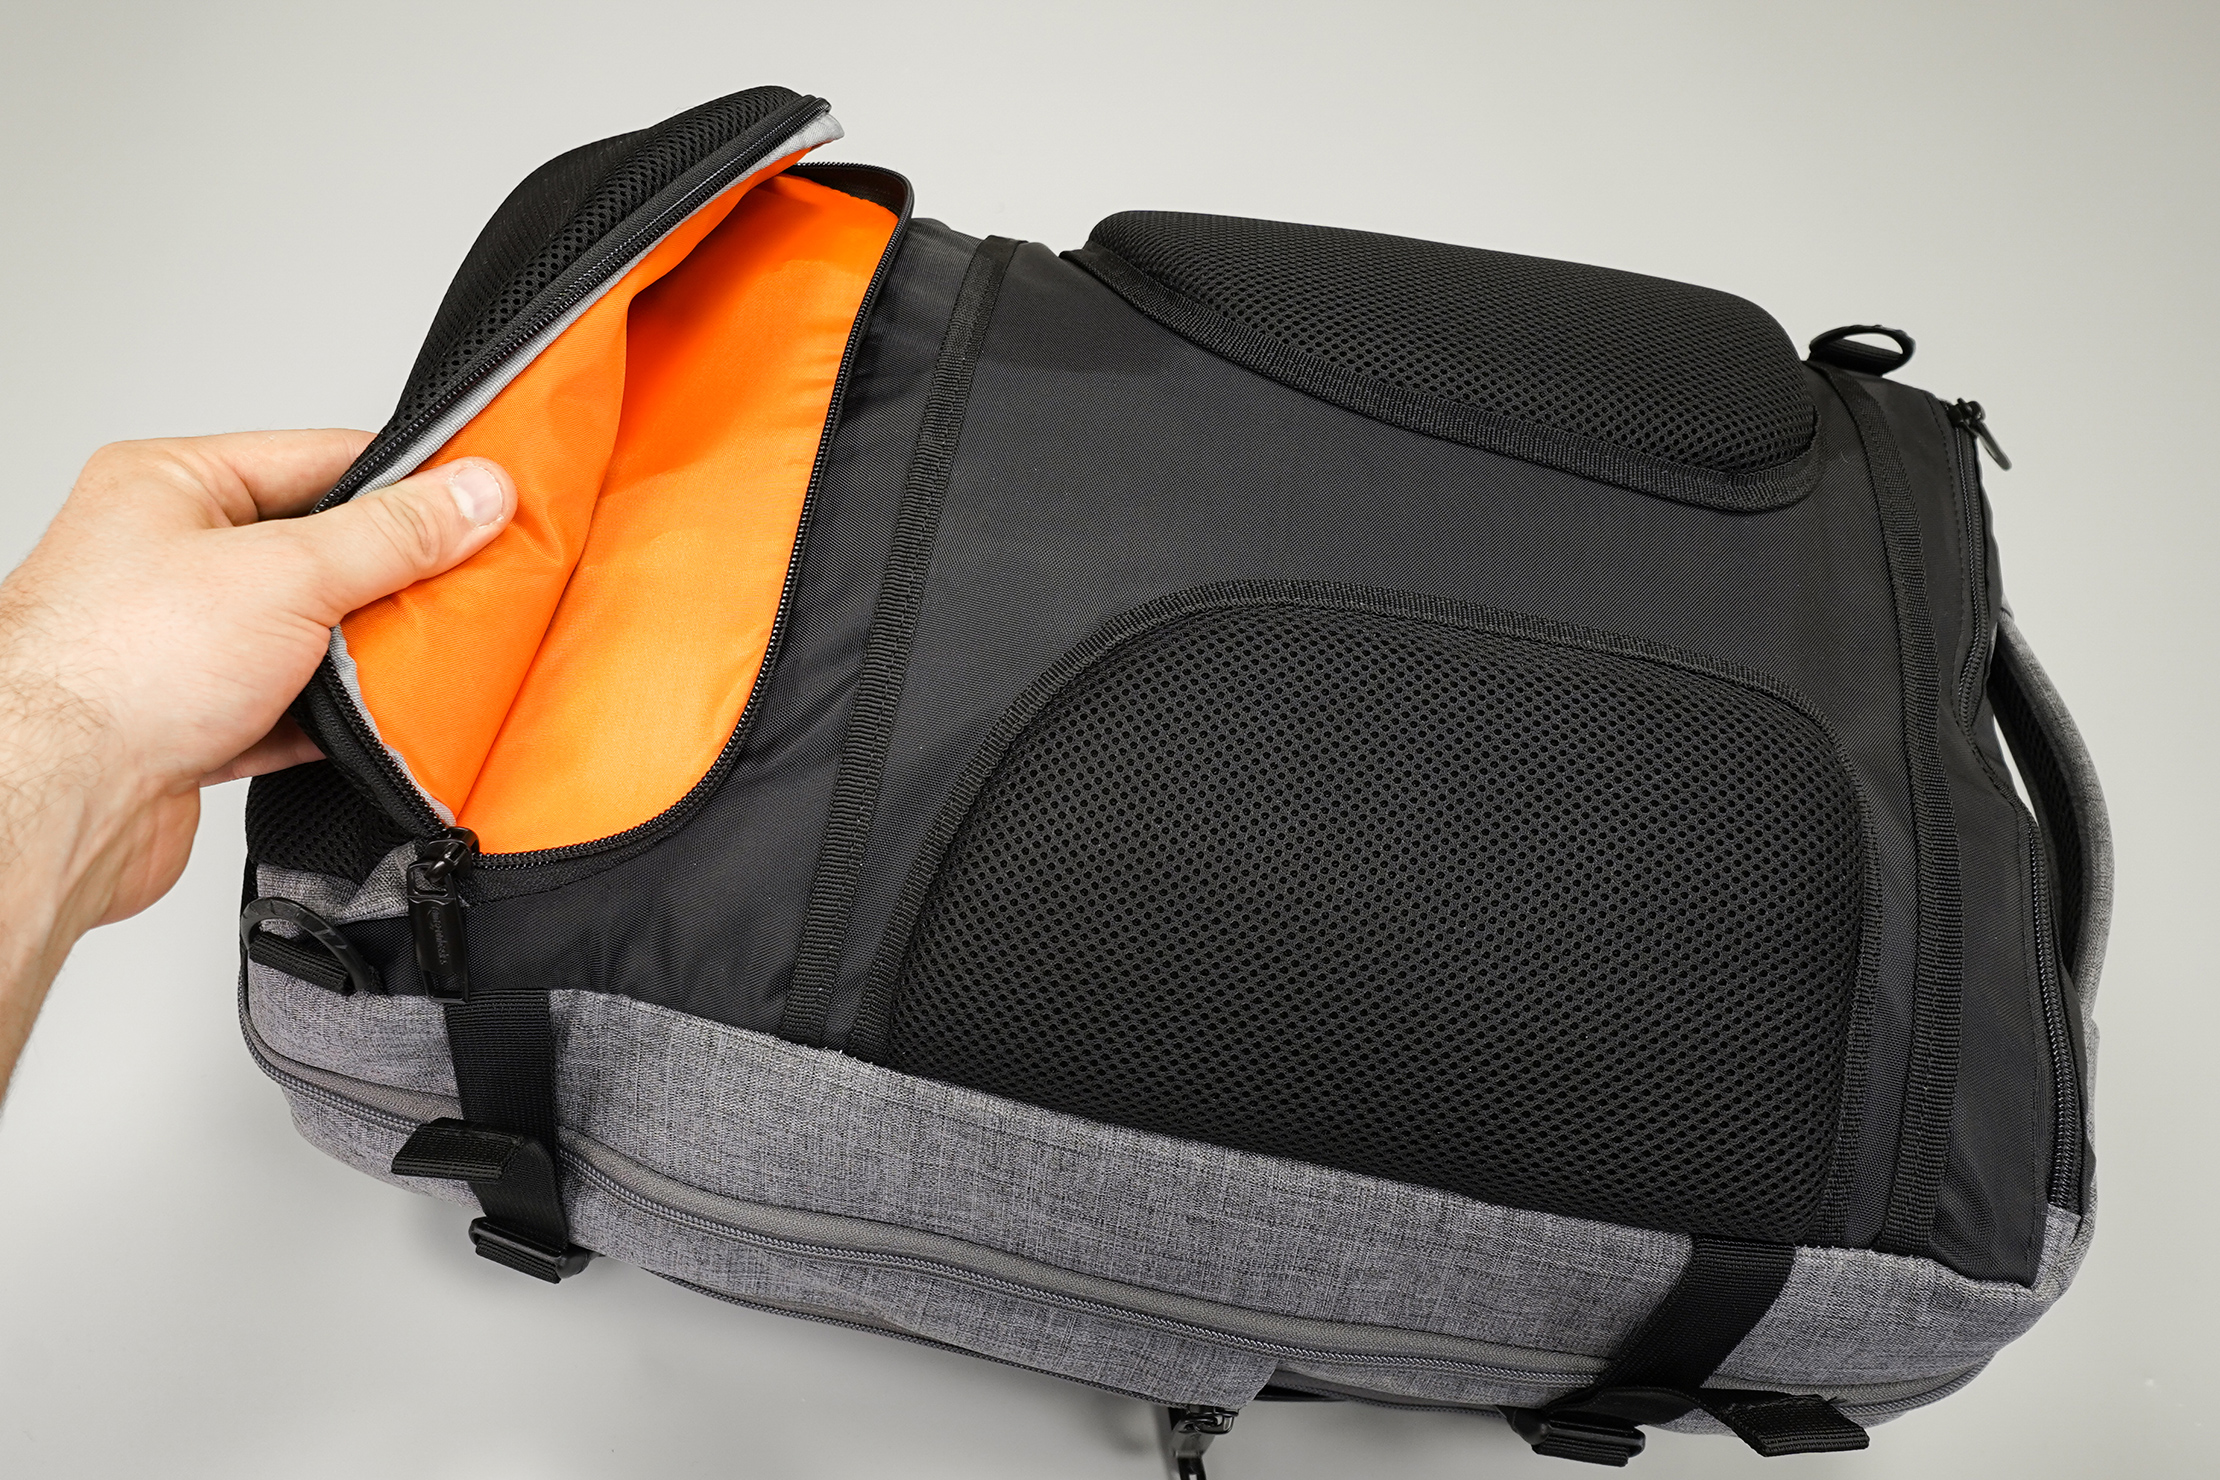 AmazonBasics Slim Travel Backpack Weekender Back Security Pocket